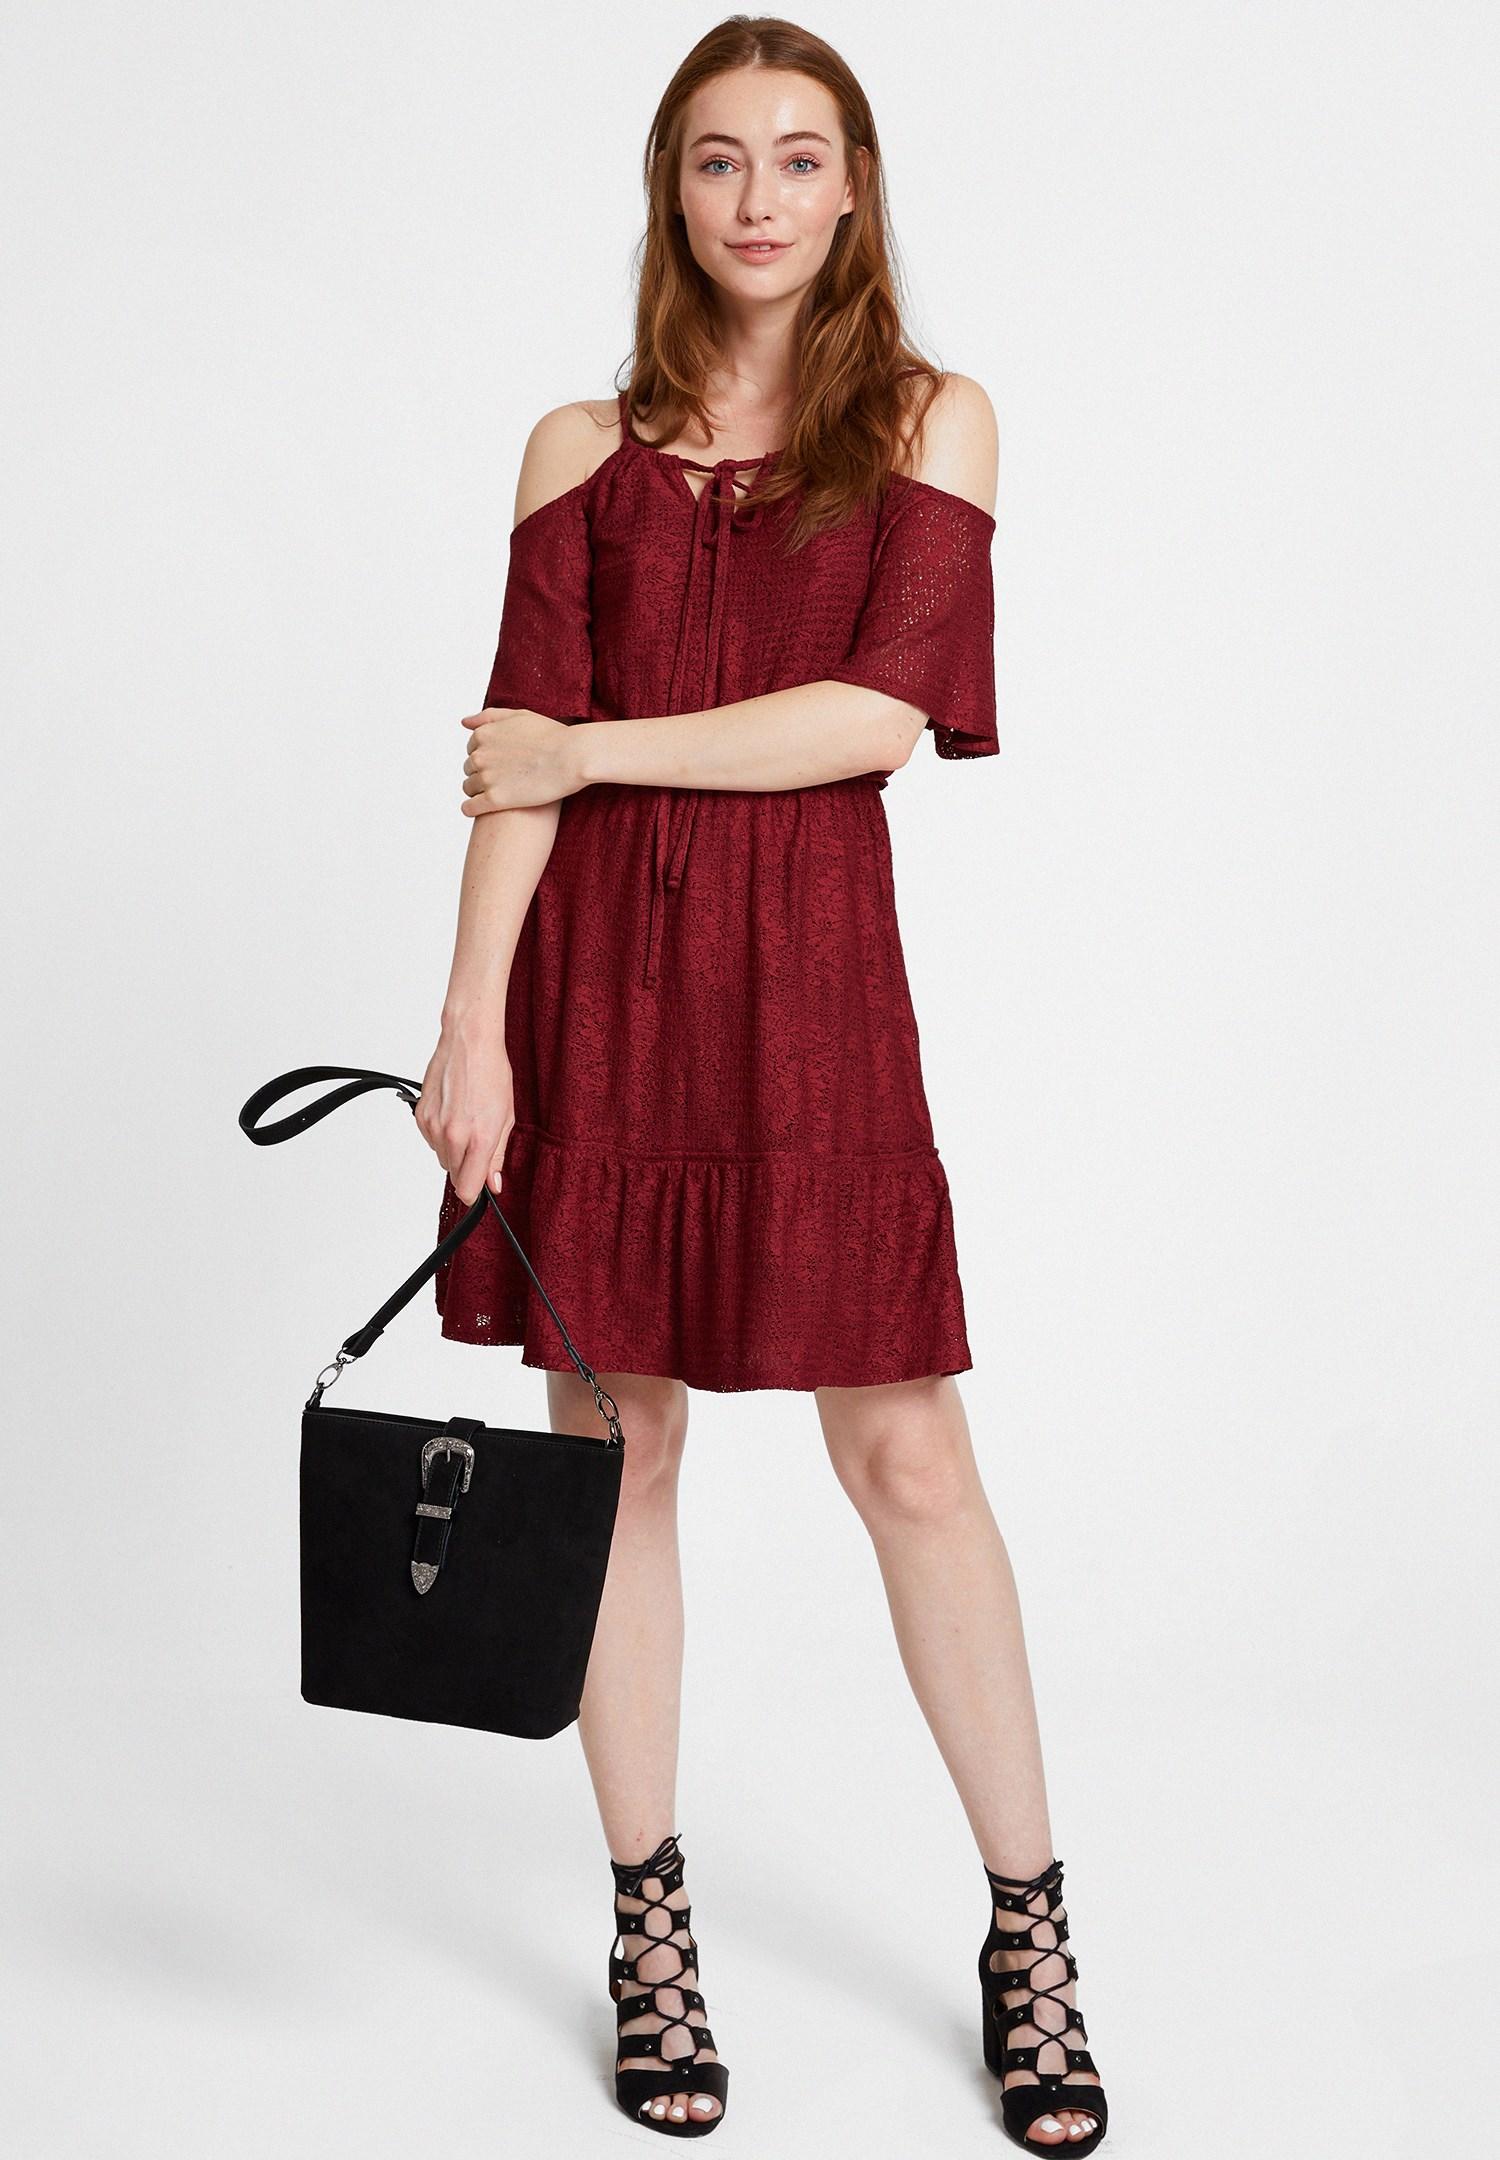 32bcfa8df43e3 Bordo Omuz Detaylı Mini Elbise Online Alışveriş 18KOX-JAKBUZEL | OXXO